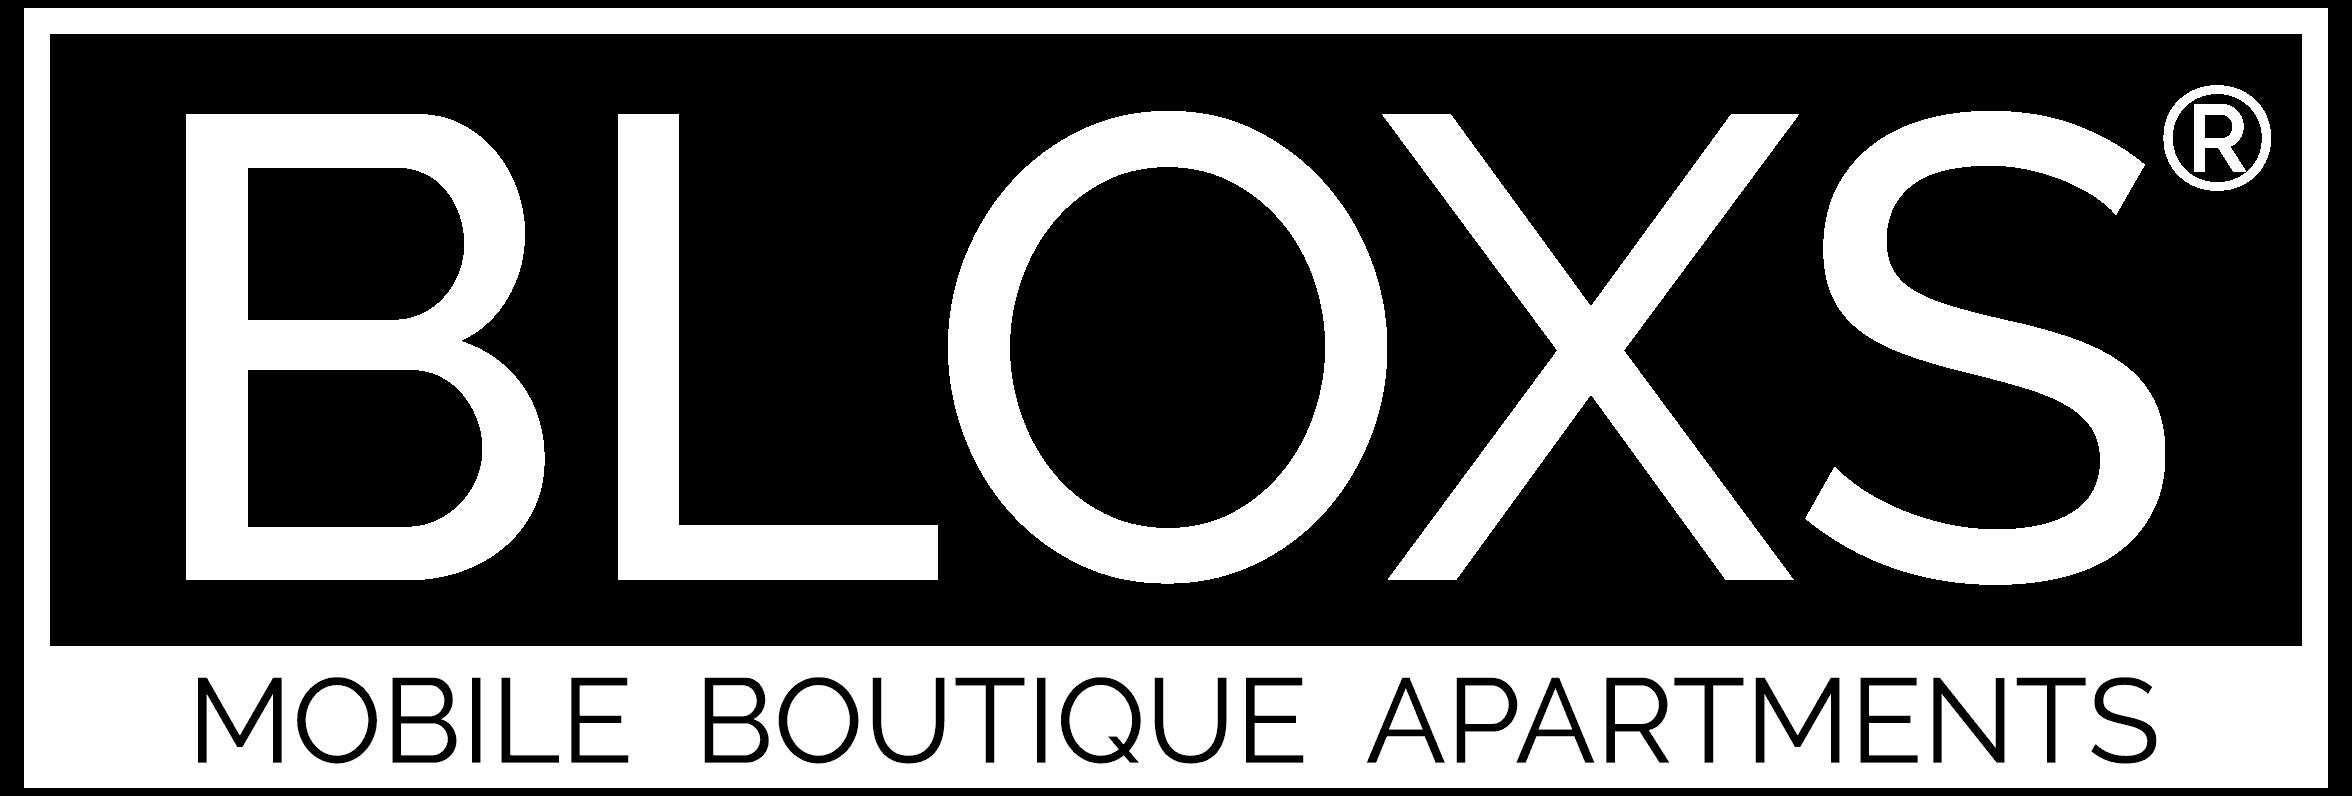 Tiny House BLOXS mobile boutique apartments